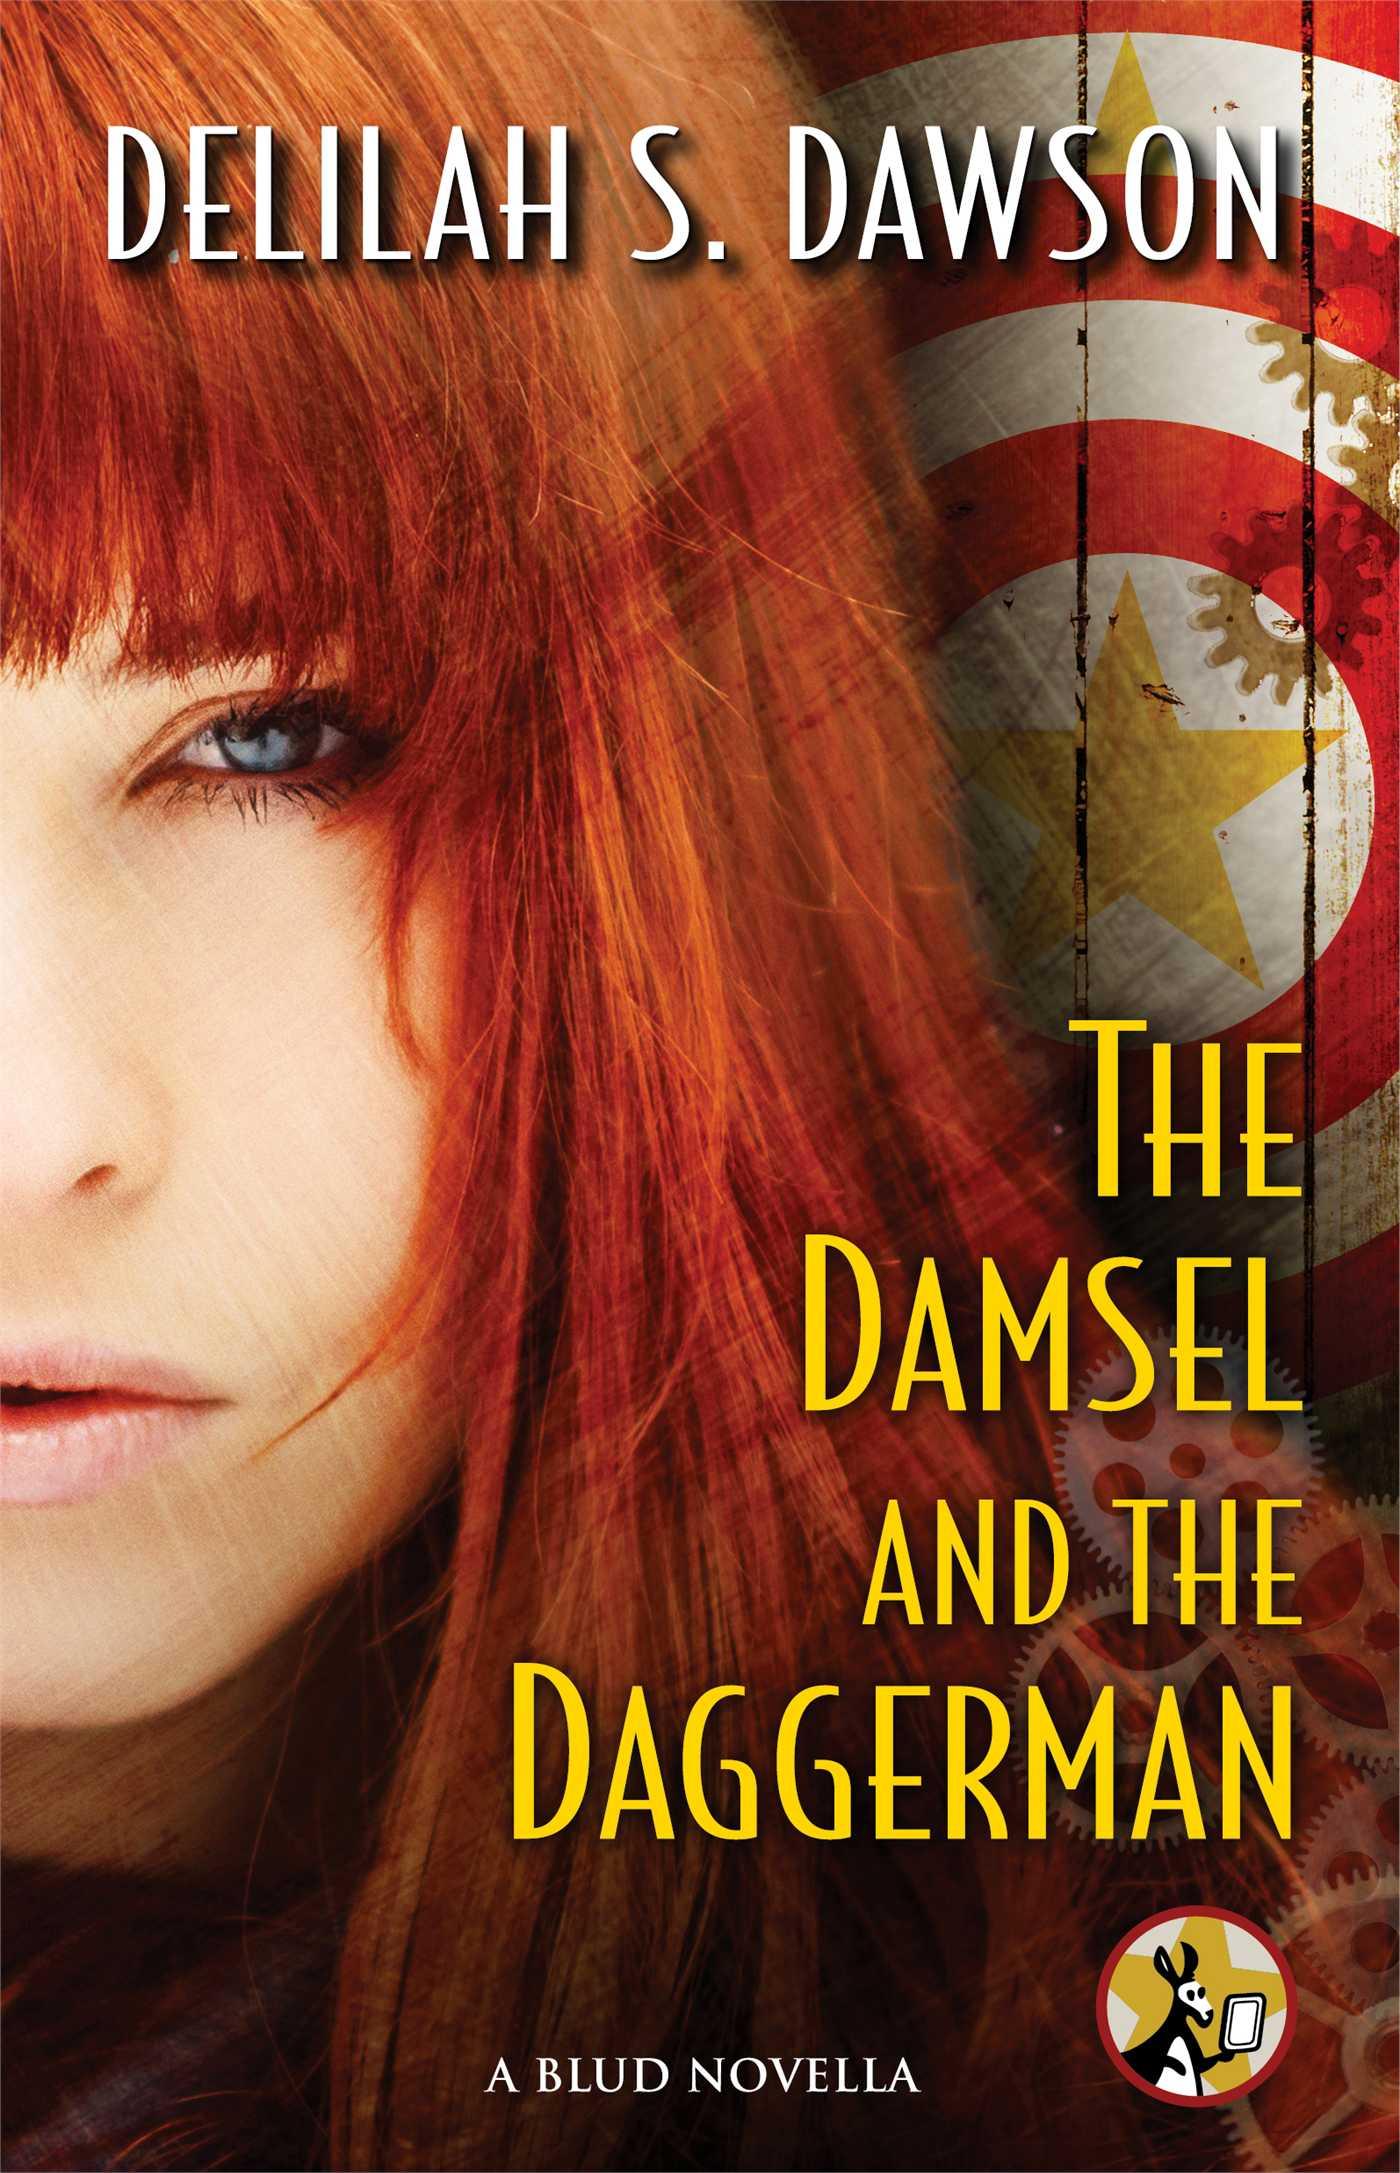 Damsel and the daggerman 9781476715438 hr